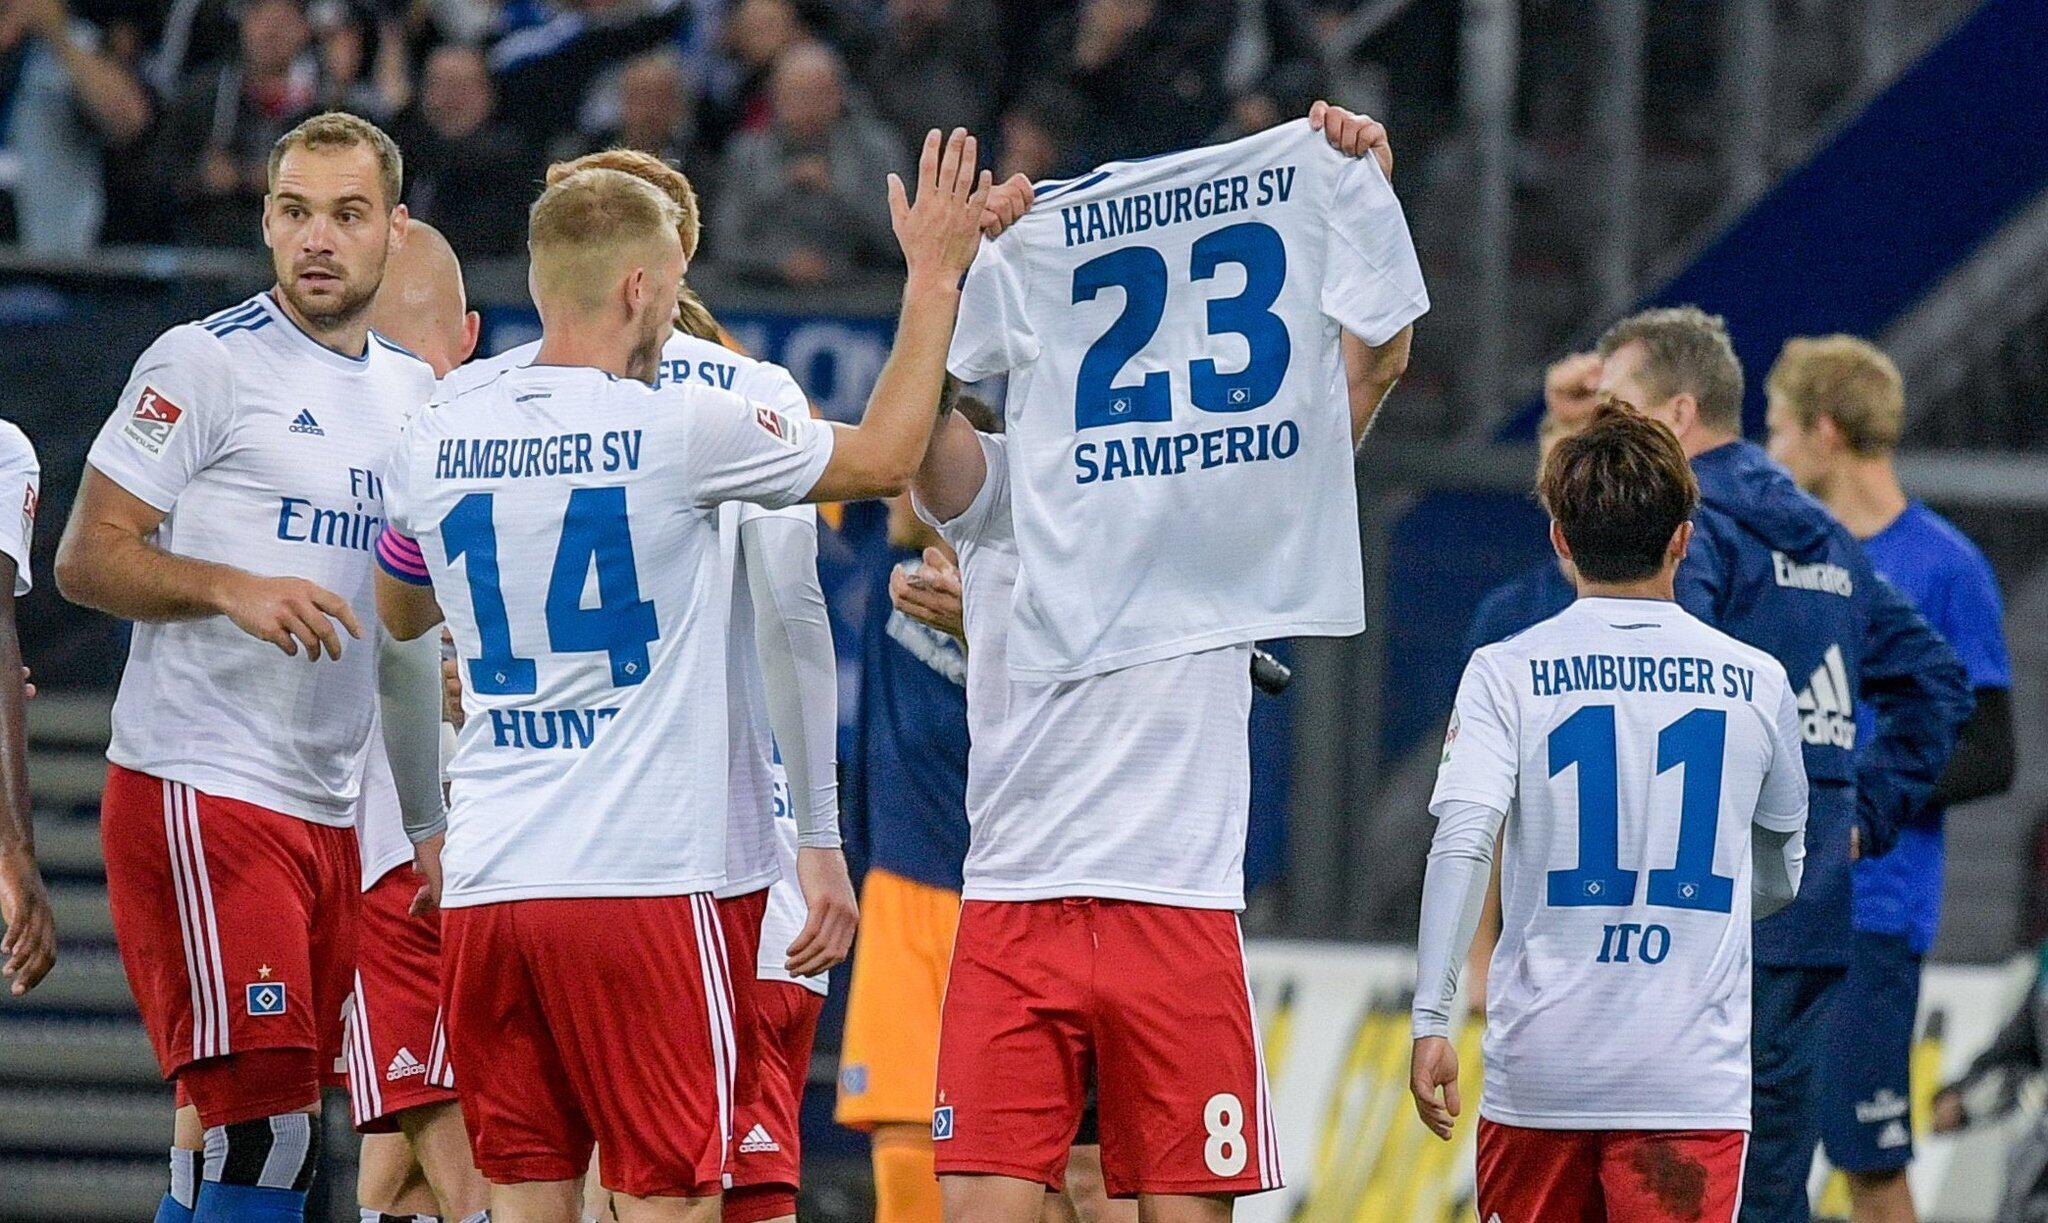 Bild zu Profis des Hamburger SV